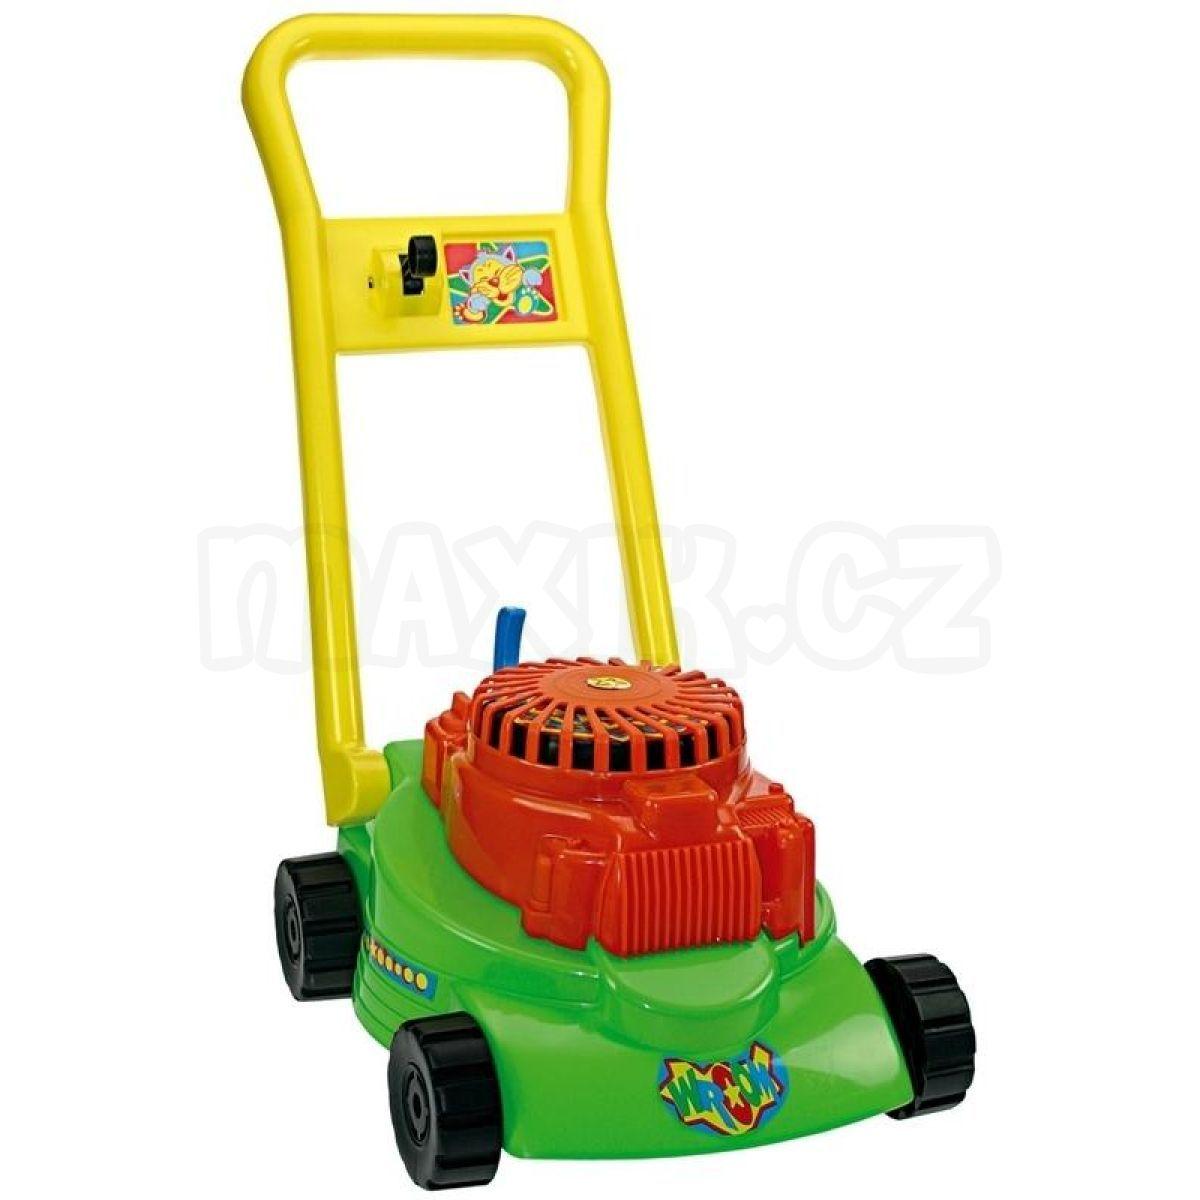 Frabar Sekačka na trávu s motorem | Maxíkovy hračky